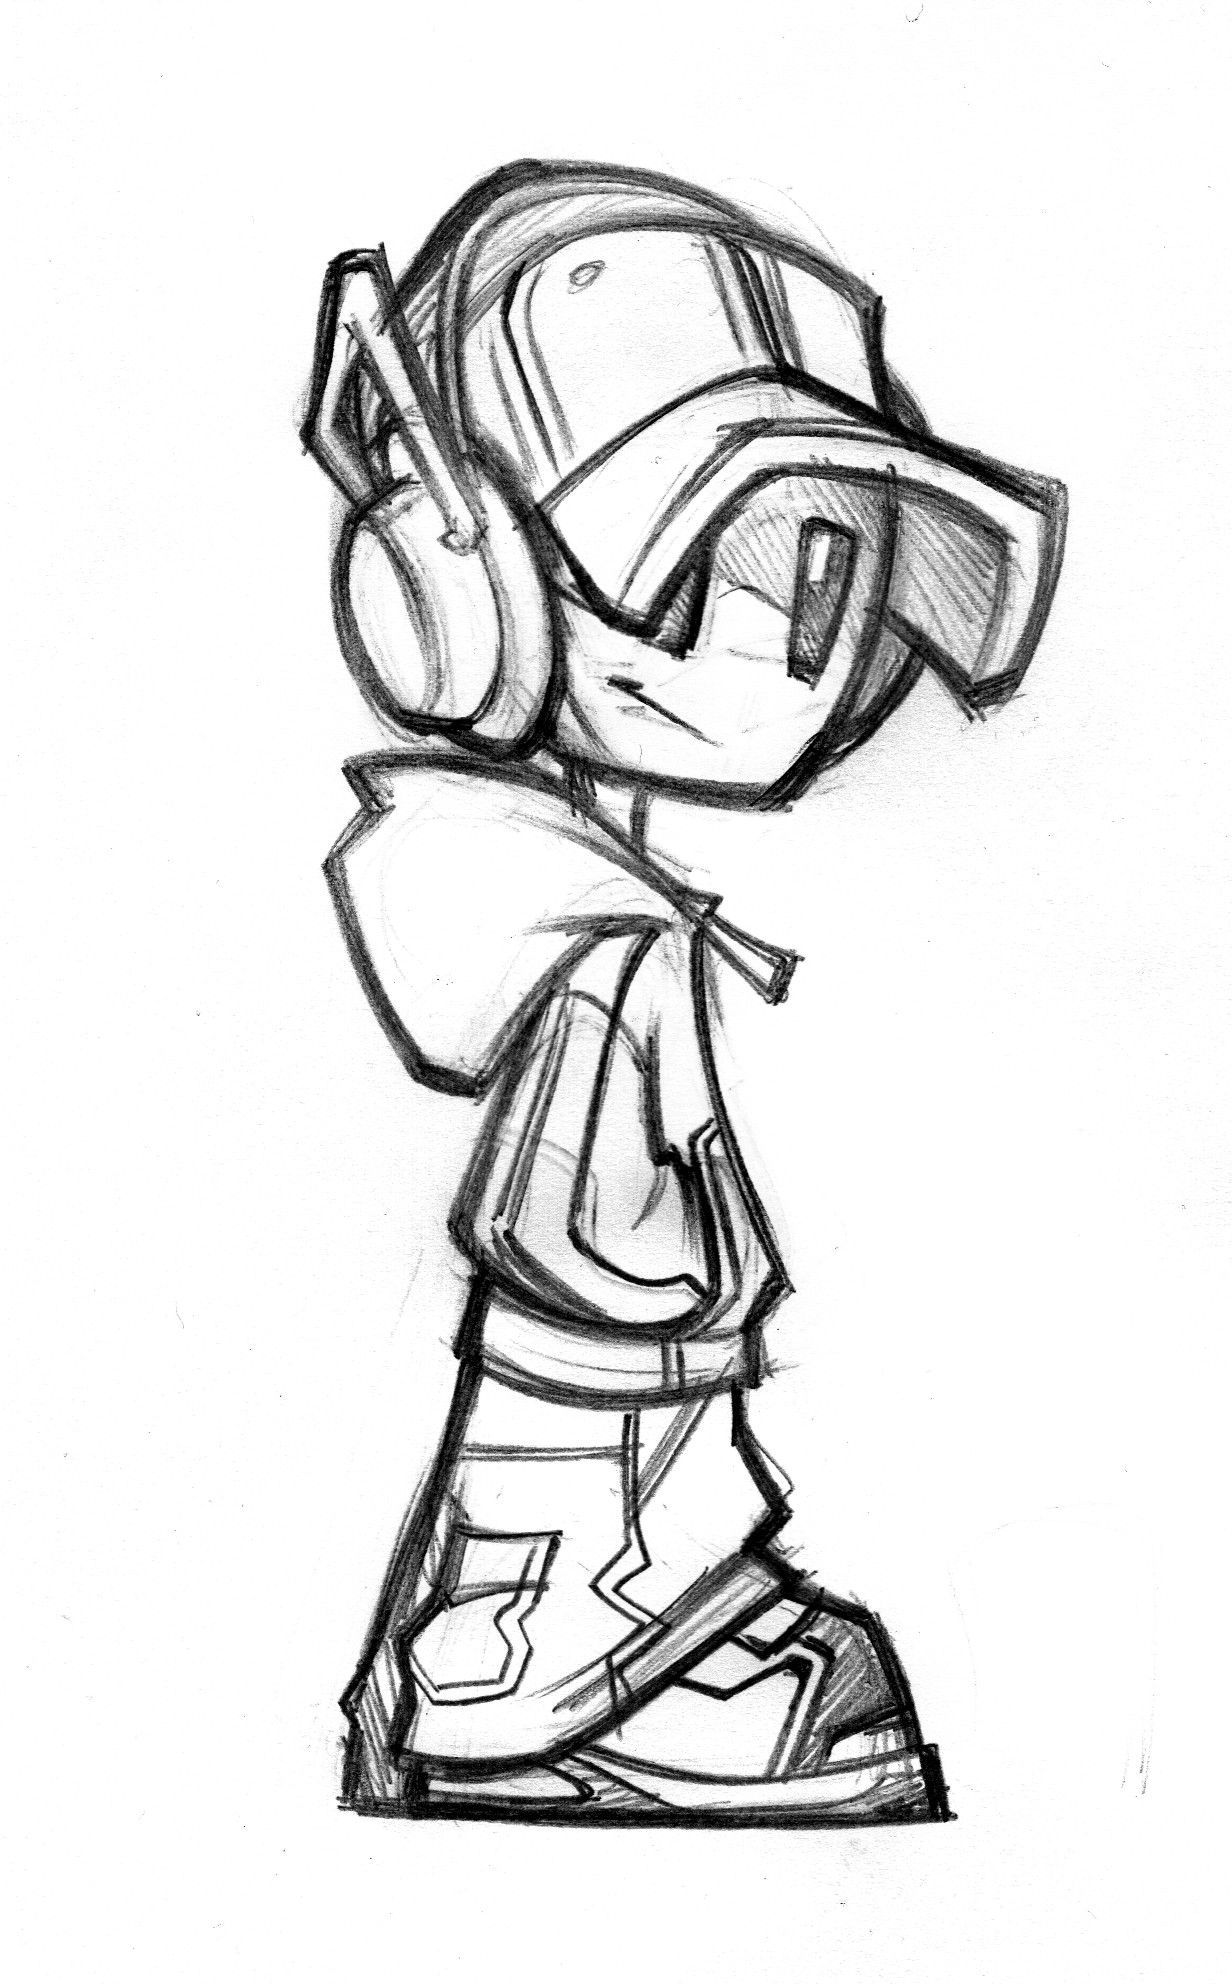 Mascot Design Projects in 2020 Graffiti characters